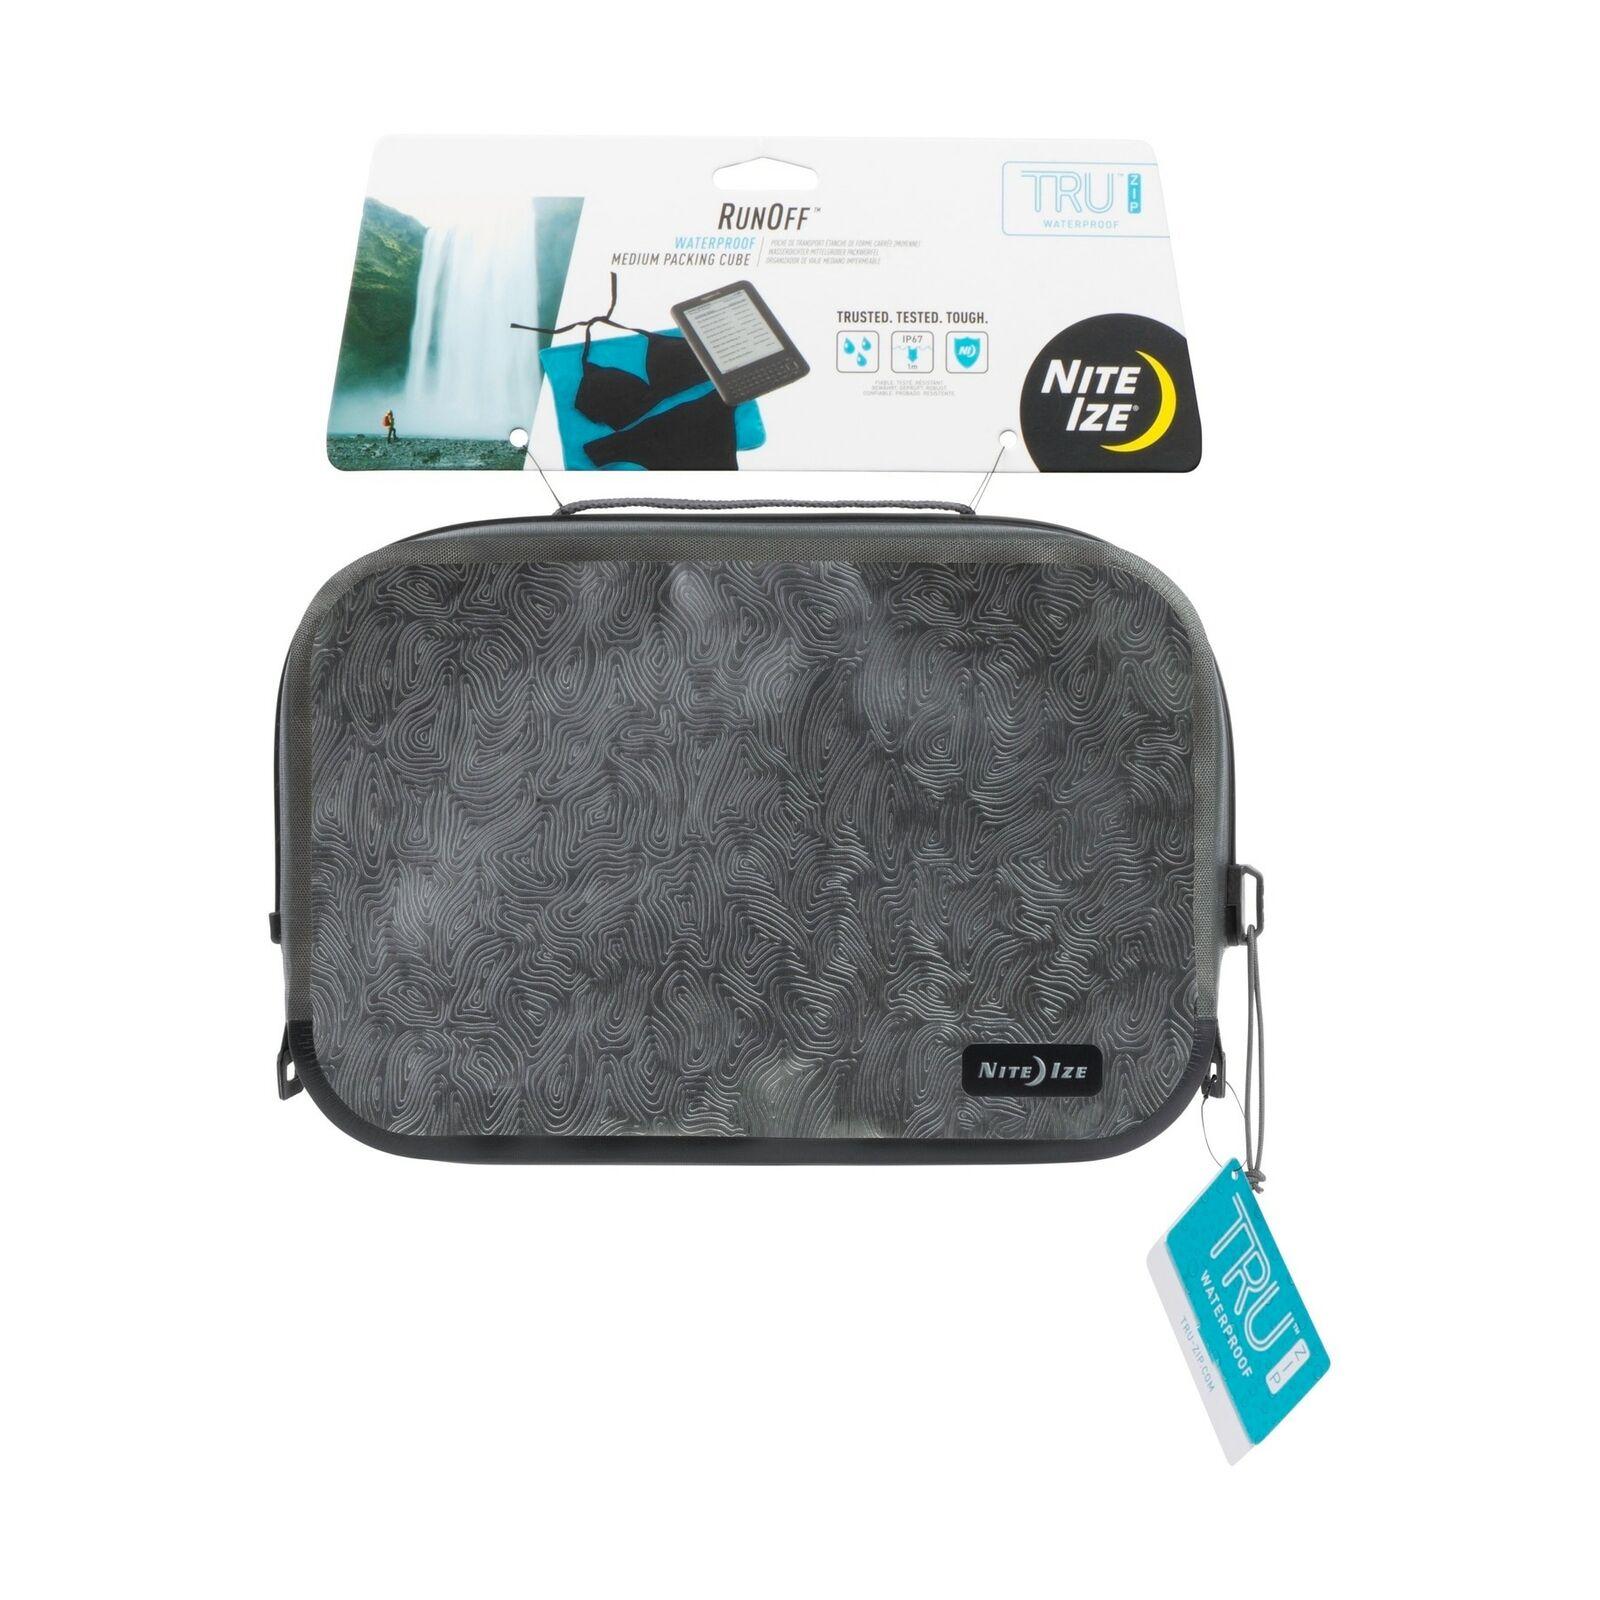 Nite Ize correreOff Waterpoof Medium Pacre Cube Compression Travel borsa 4Pack